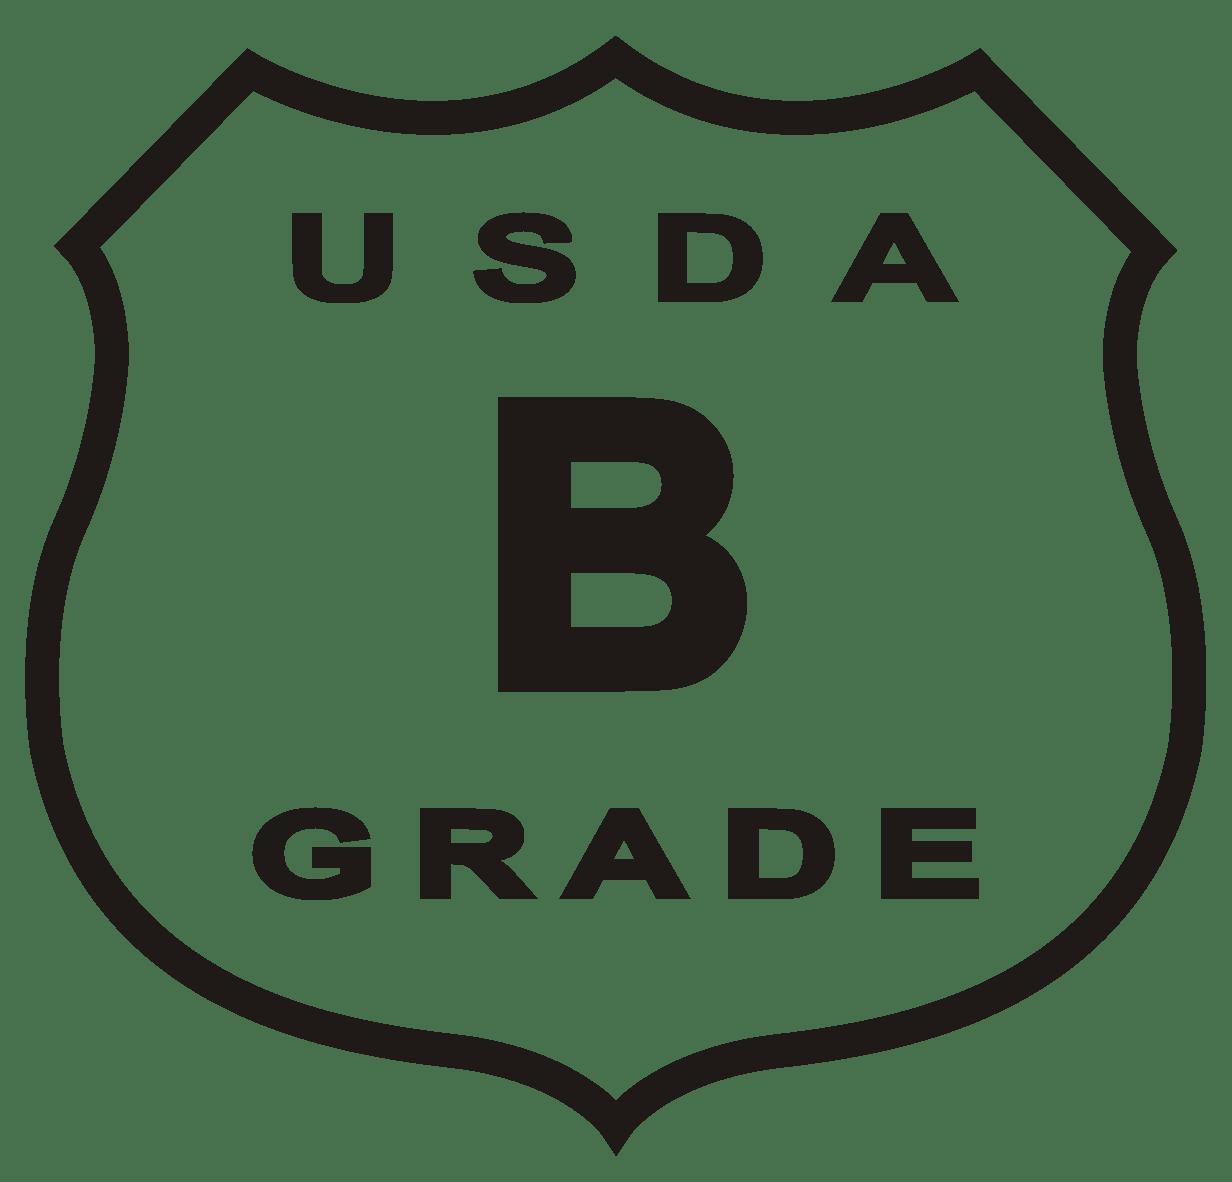 Grades clipart grade level, Grades grade level Transparent